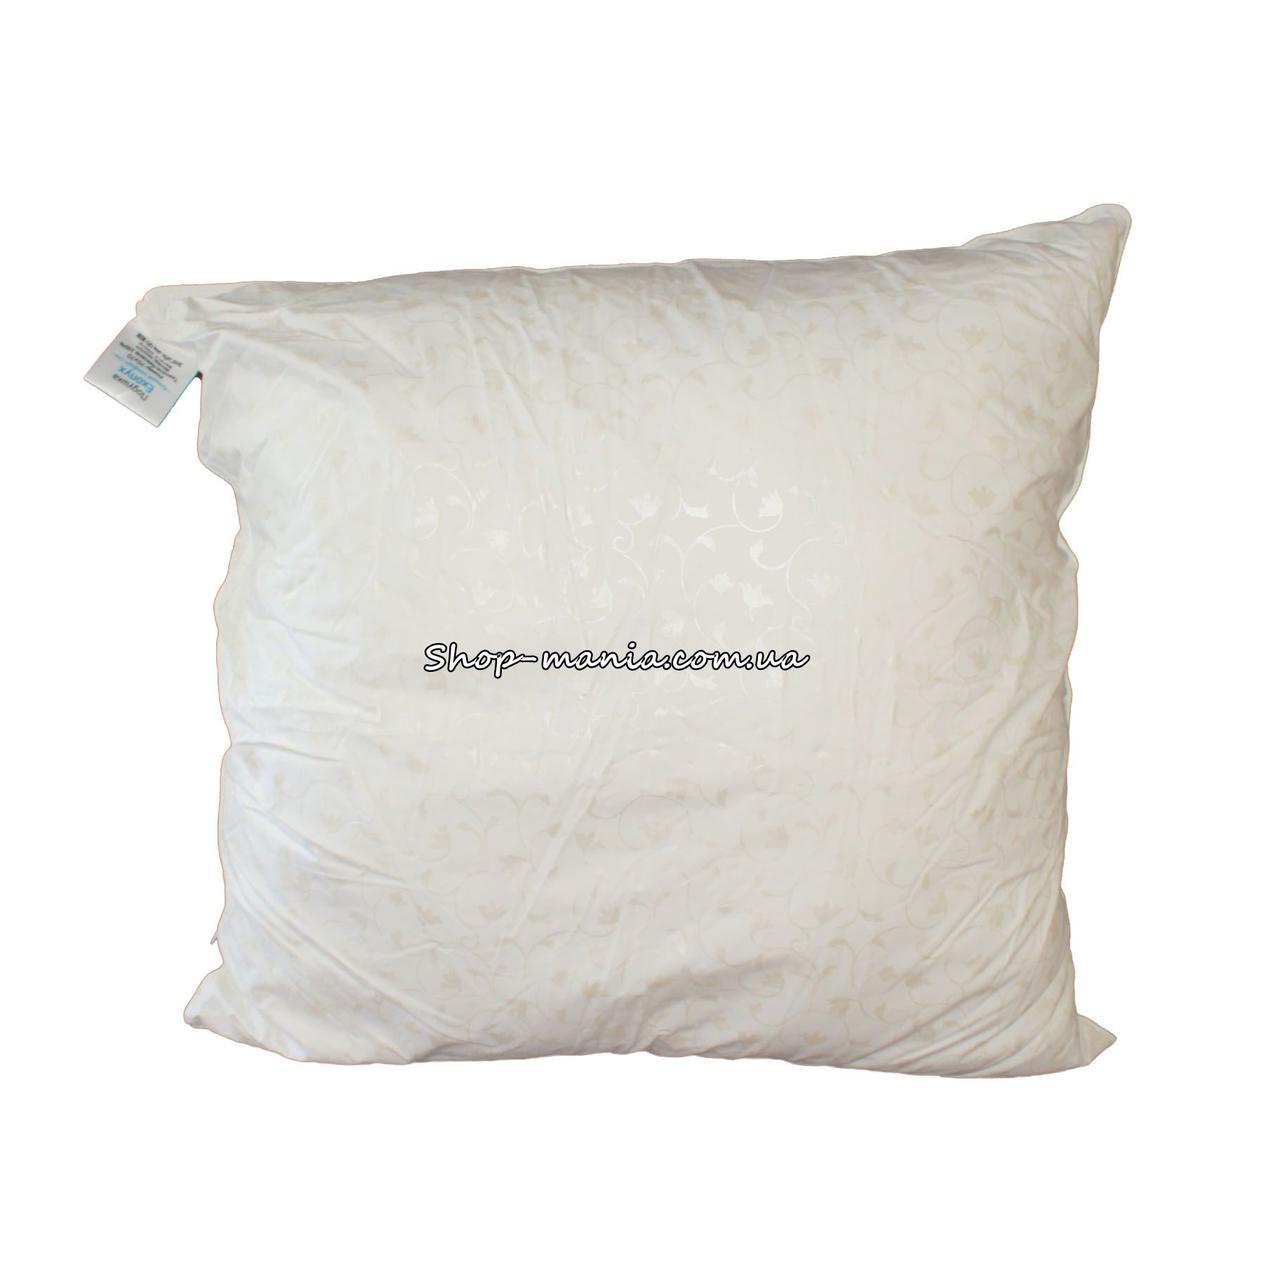 Подушка антиаллергенная экопух 70х70 см ODA SM 8201